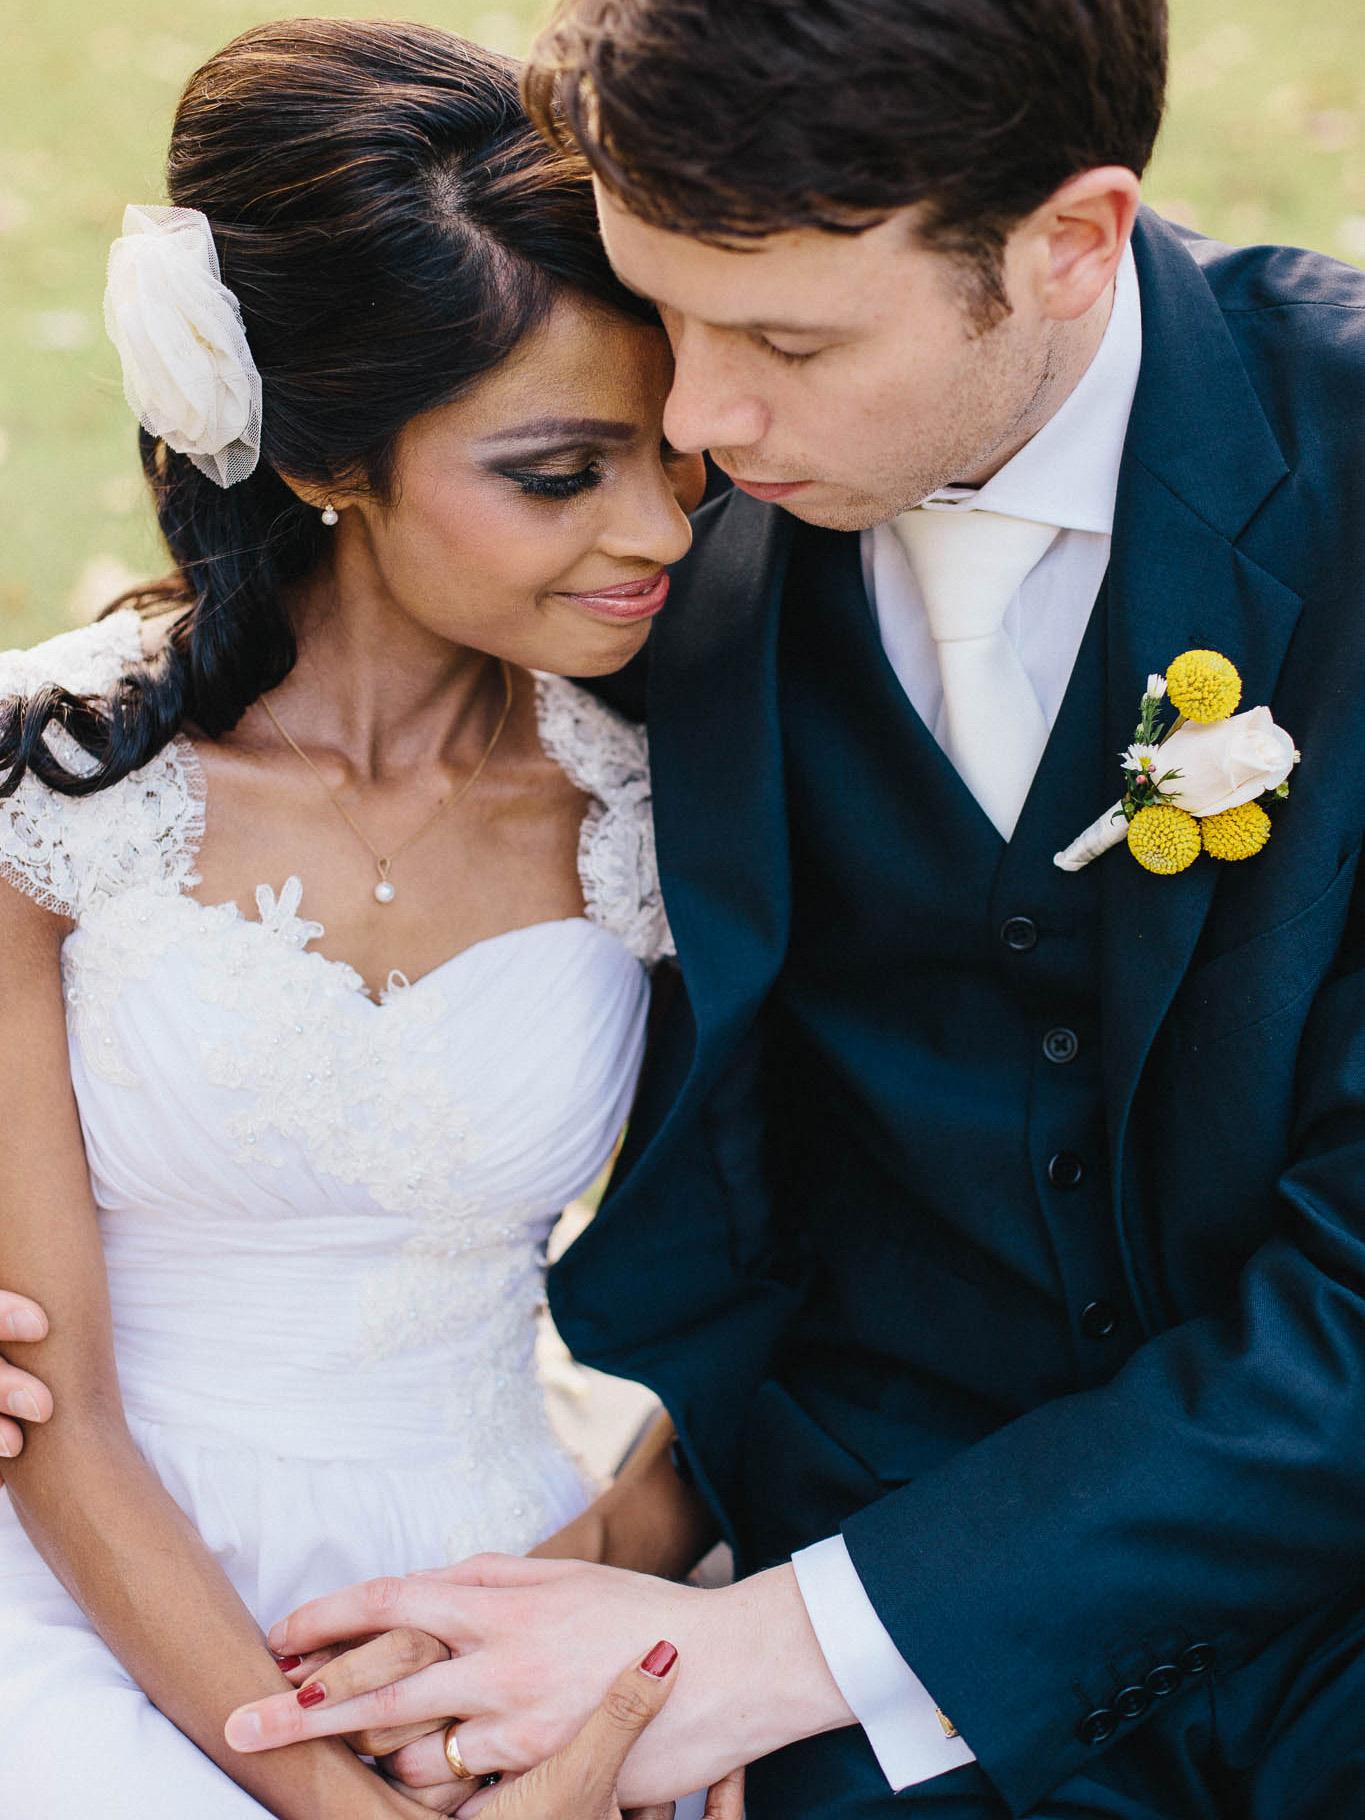 singapore-wedding-photographer-malay-indian-pre-wedding-travel-wmt-2015-44.jpg